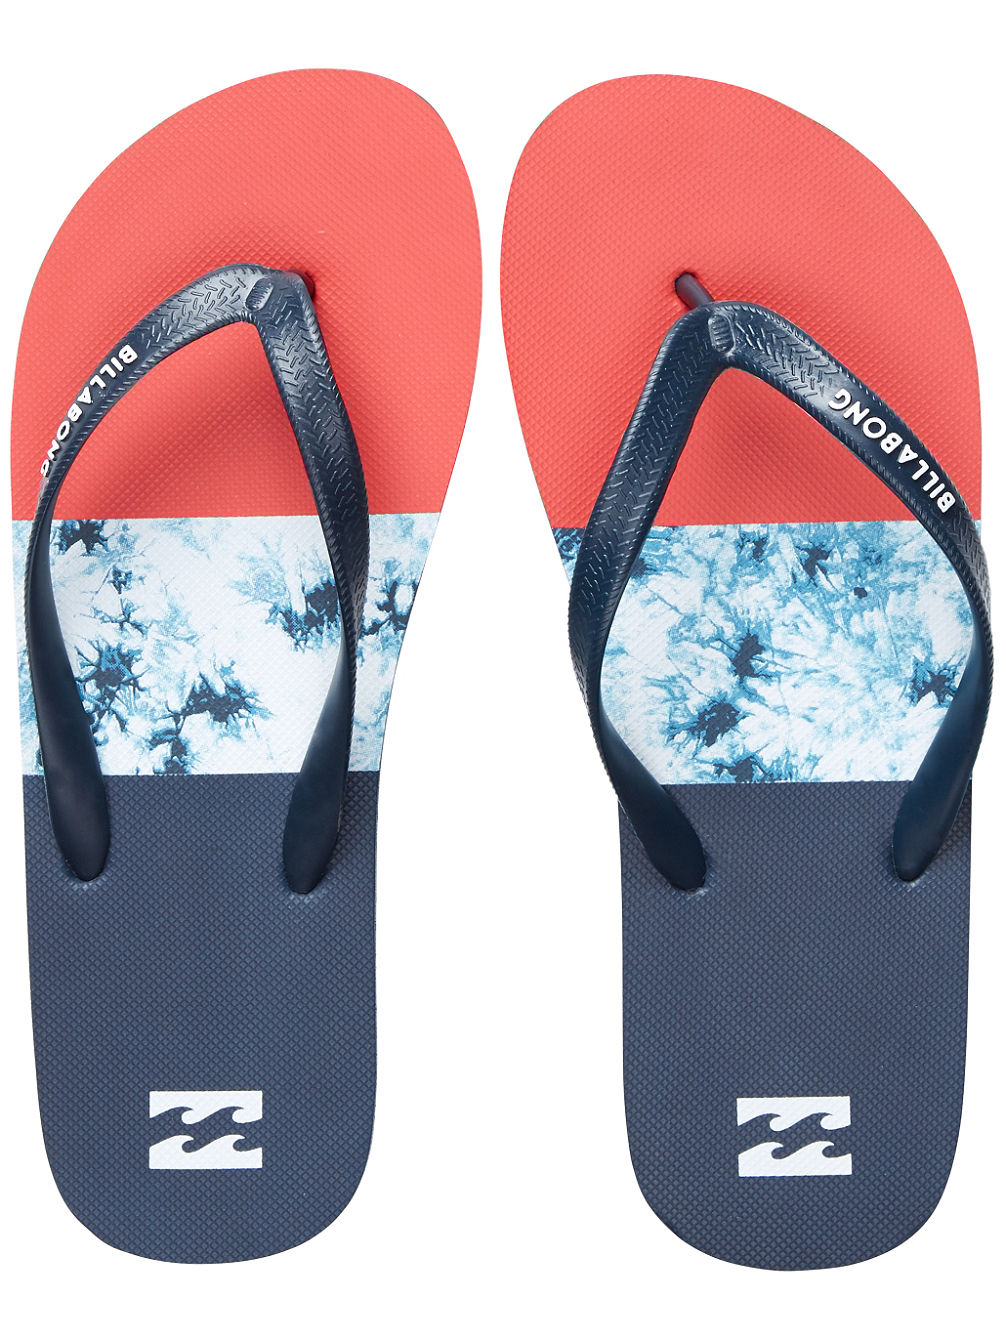 billabong-tides-tribong-sandals